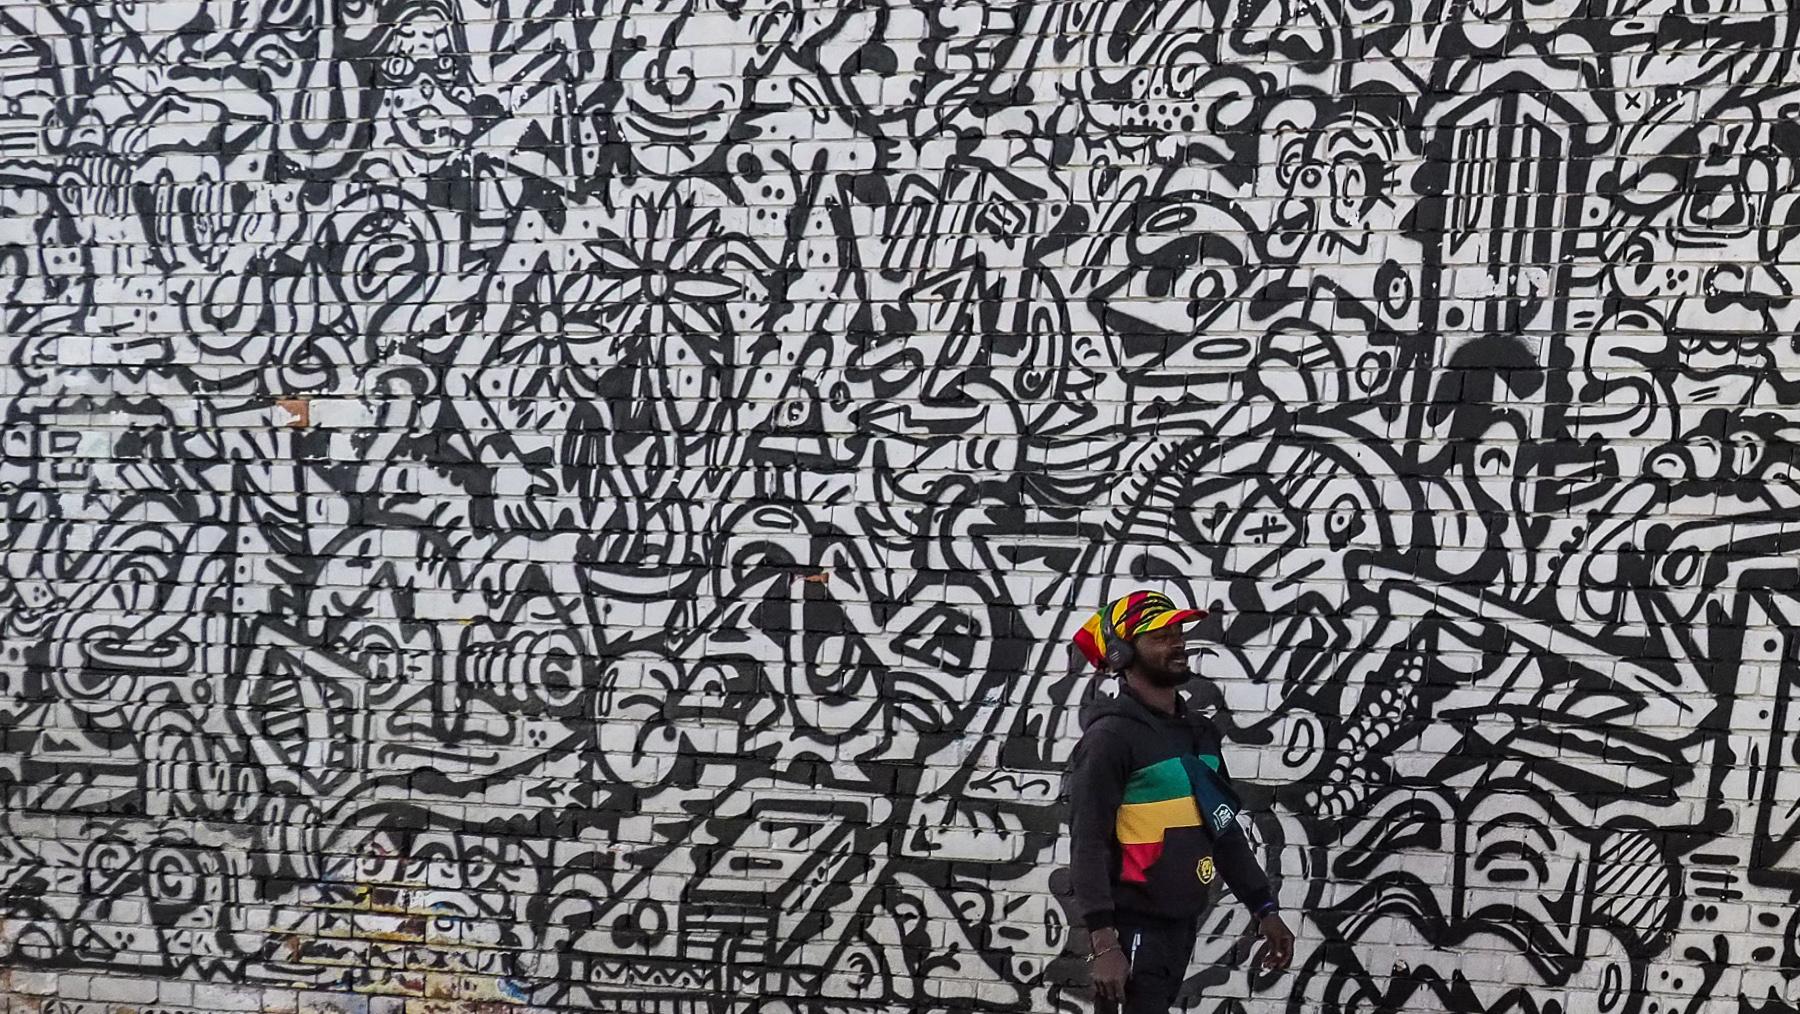 Street- und Lebensart in Bogota